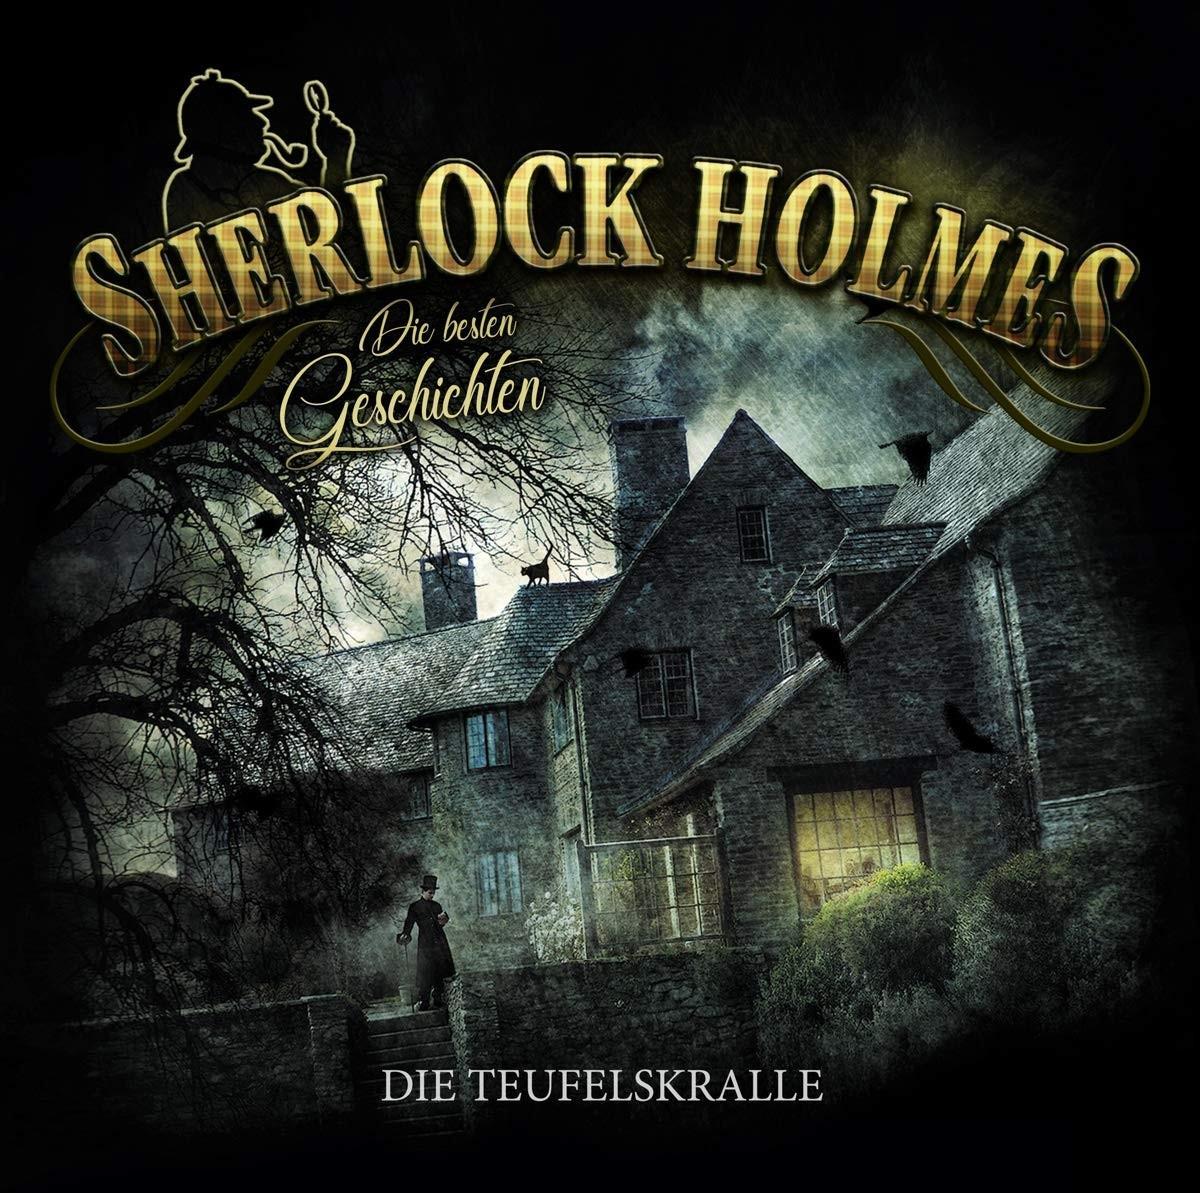 Sherlock Holmes - Die besten Geschichten - Folge 1: Die Teufelskralle (Vinyl LP)